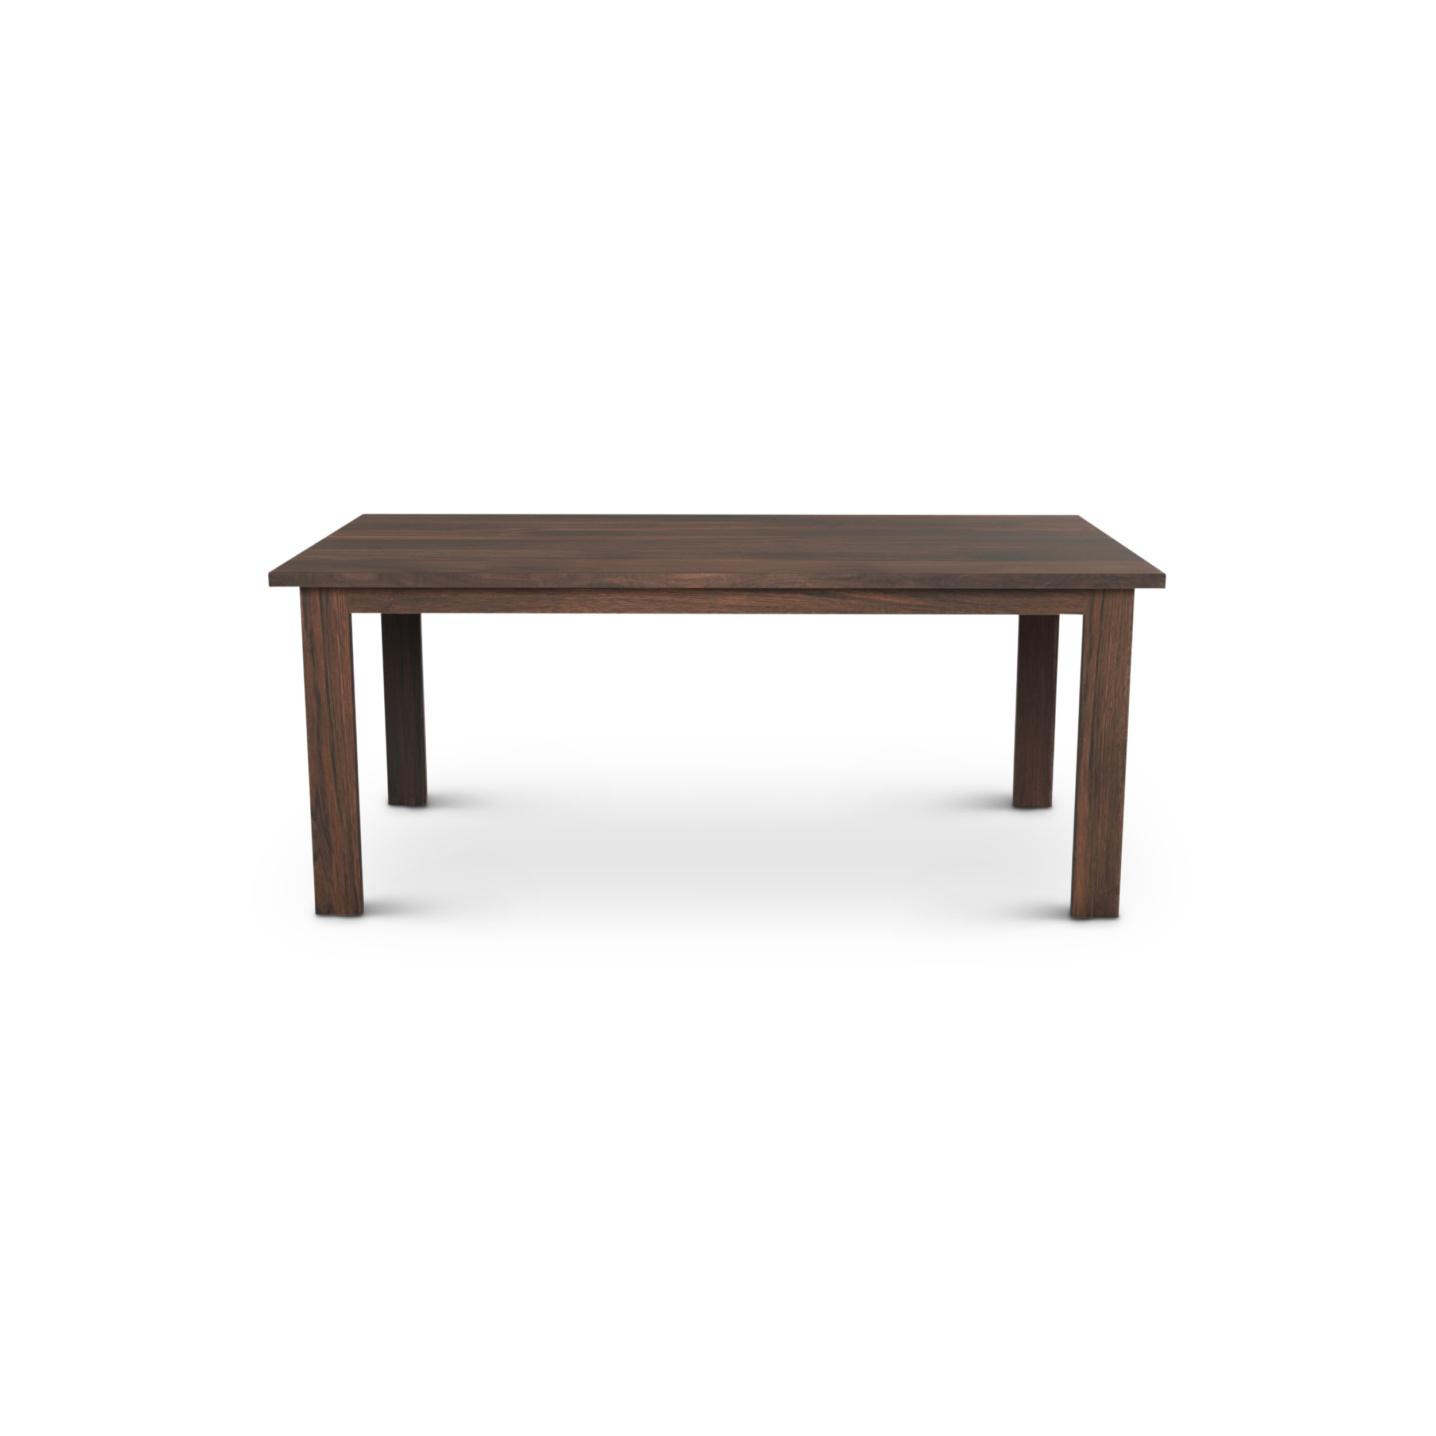 Walnut wood Table with rectangular legs